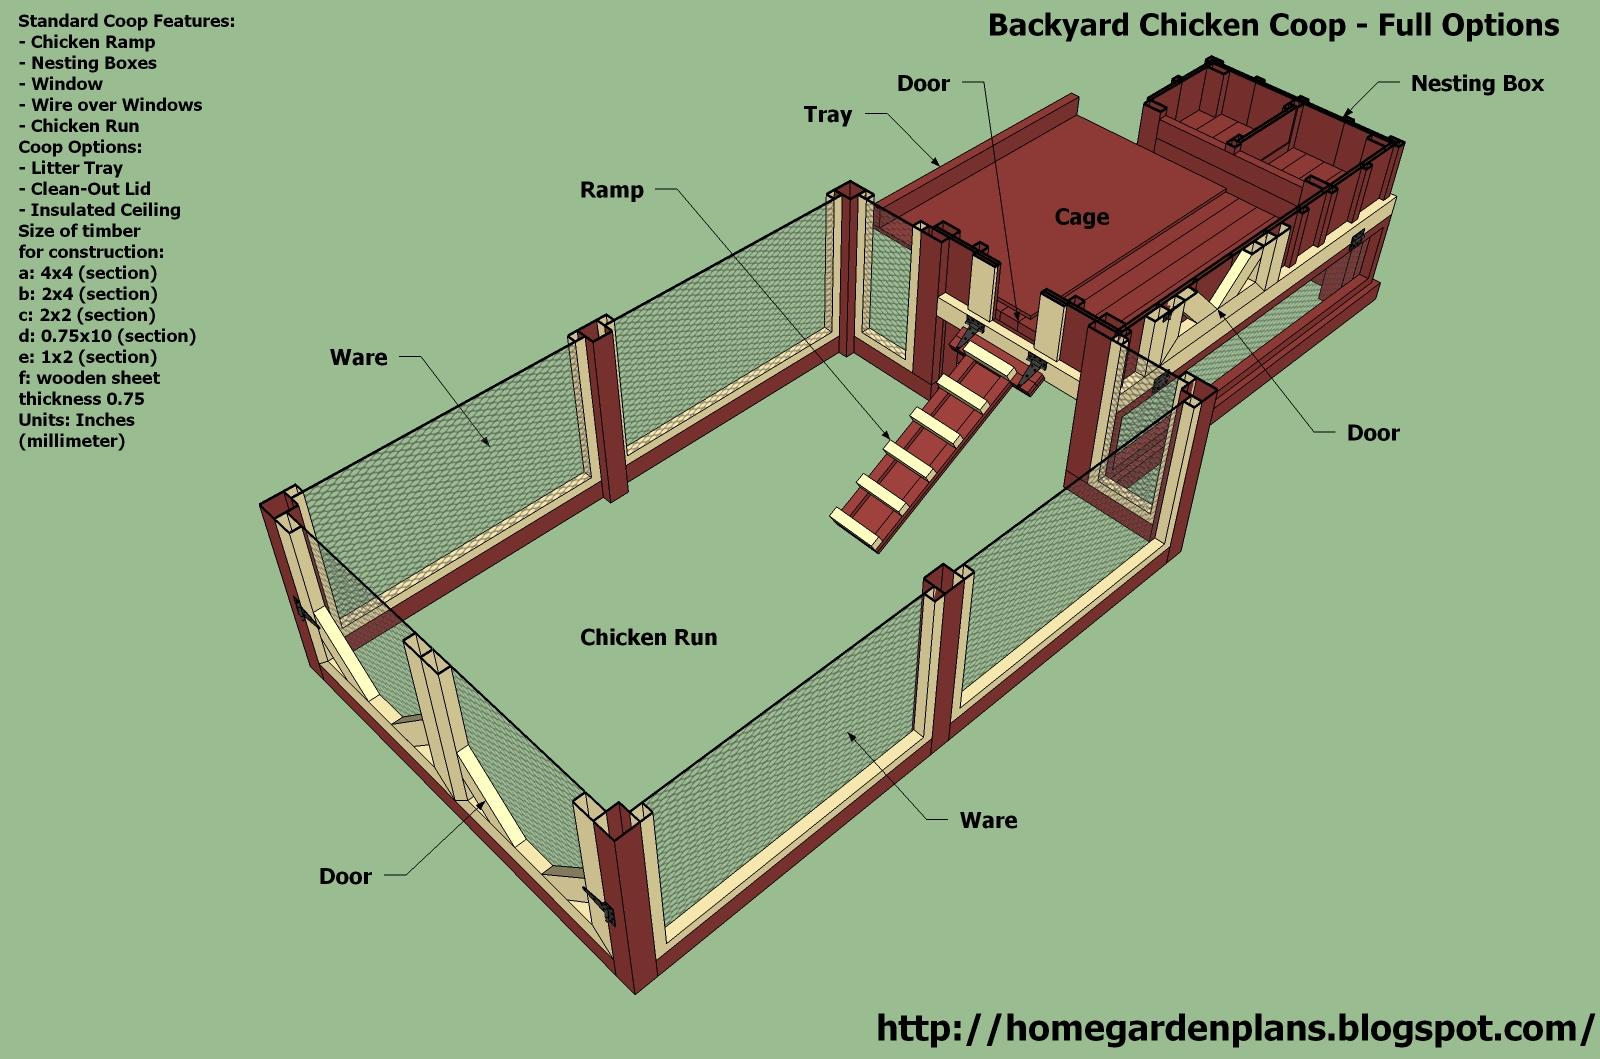 home garden plans: S101 - Chicken Coop Plans Construction ...